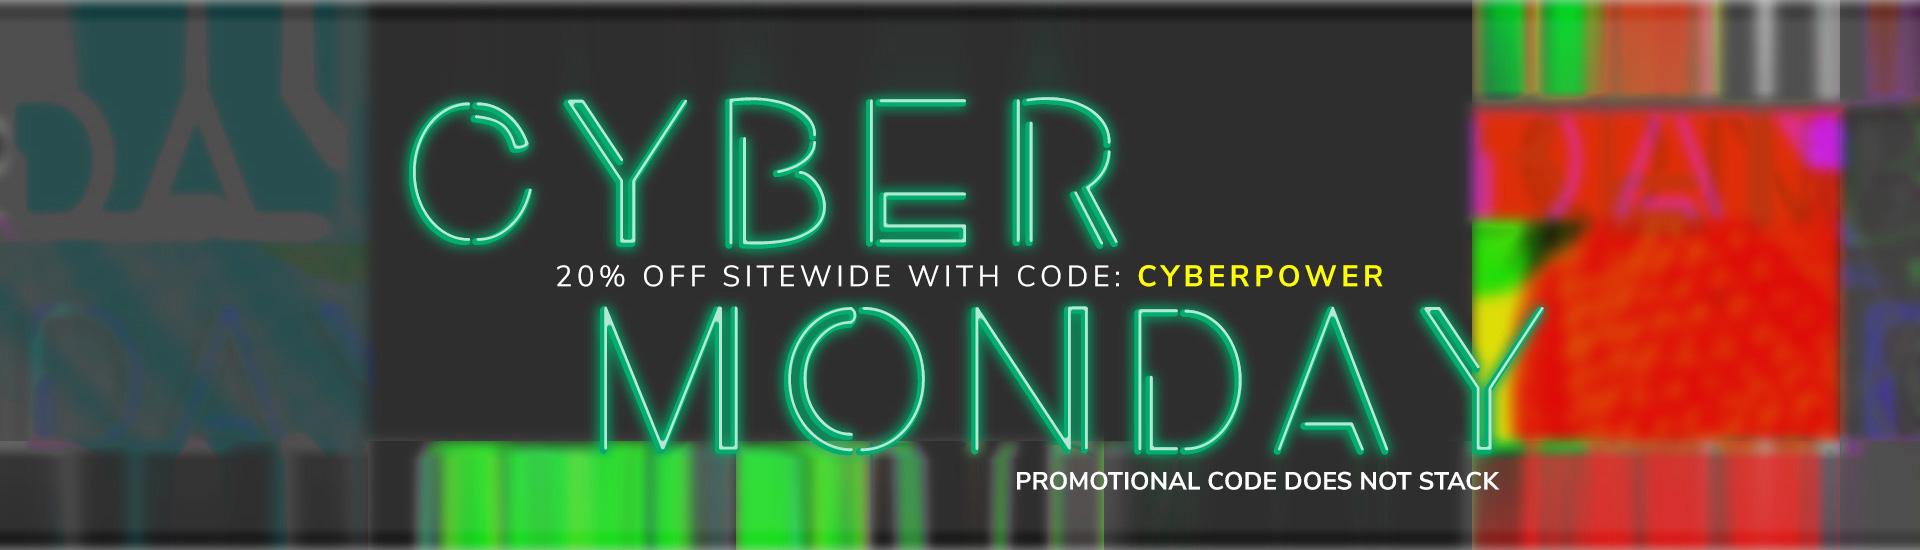 cybermonday-power.jpg